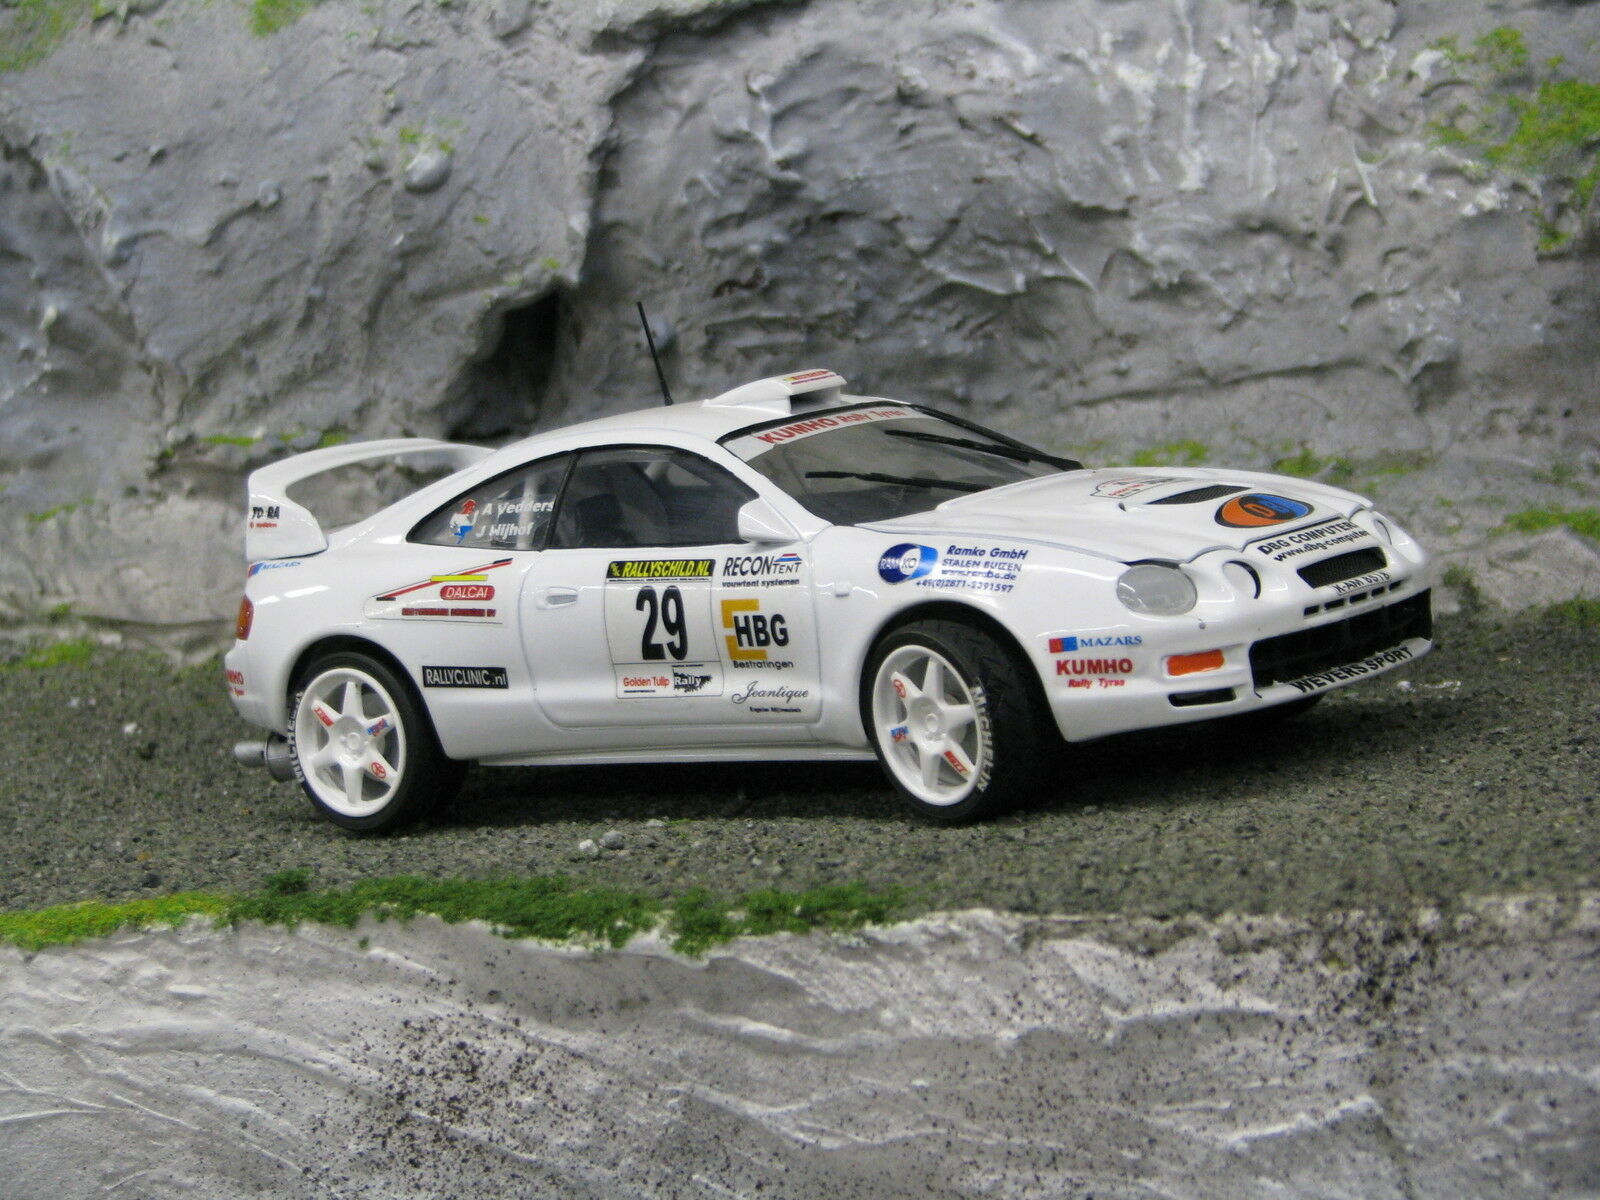 QSP Toyota Celica GT-Four 1 24  29 Nijhof   Vedders oren Tulip Rally 2004